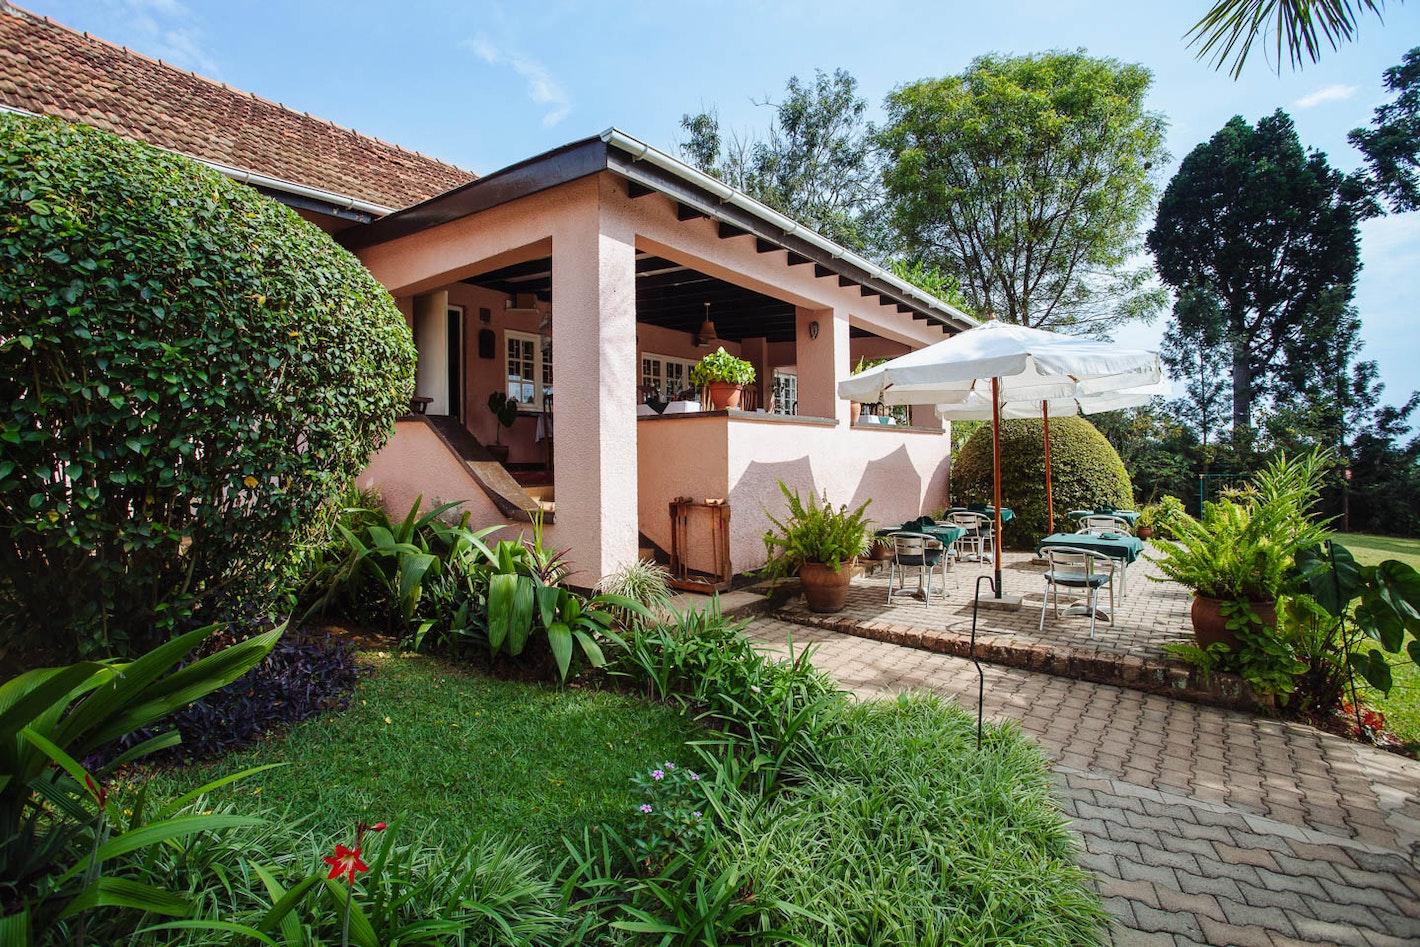 karibu guest house uganda timbuktu travel